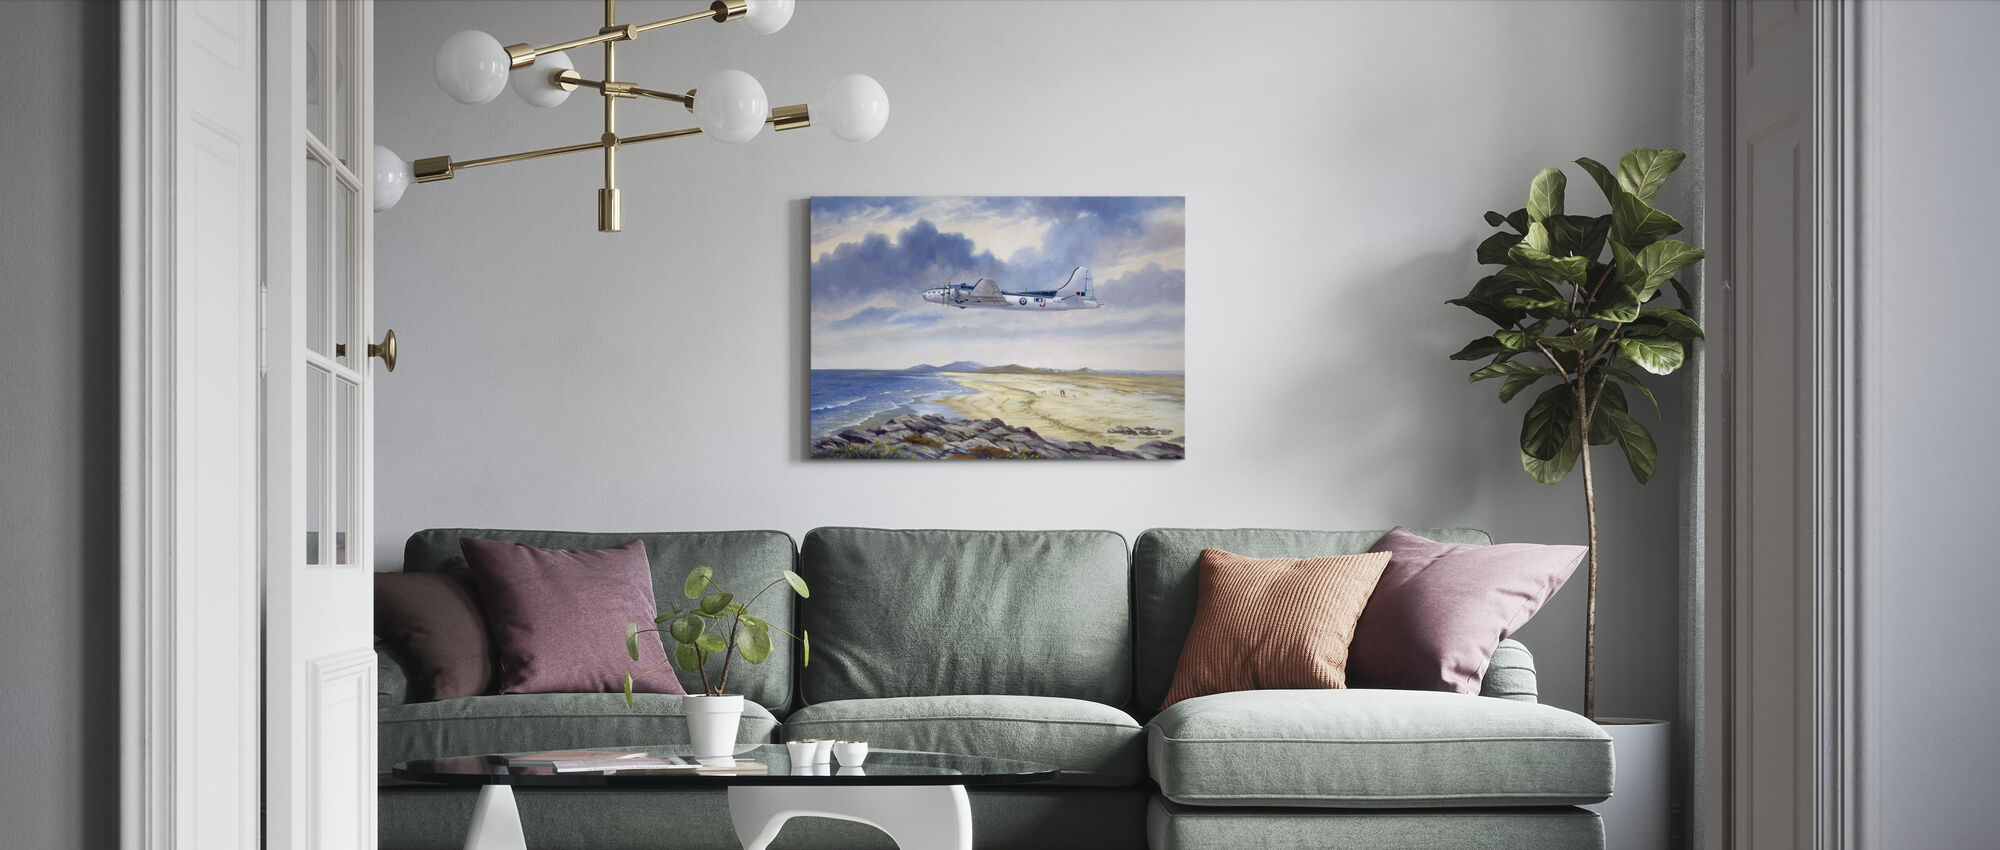 B17 Over Benbecula - Canvas print - Living Room